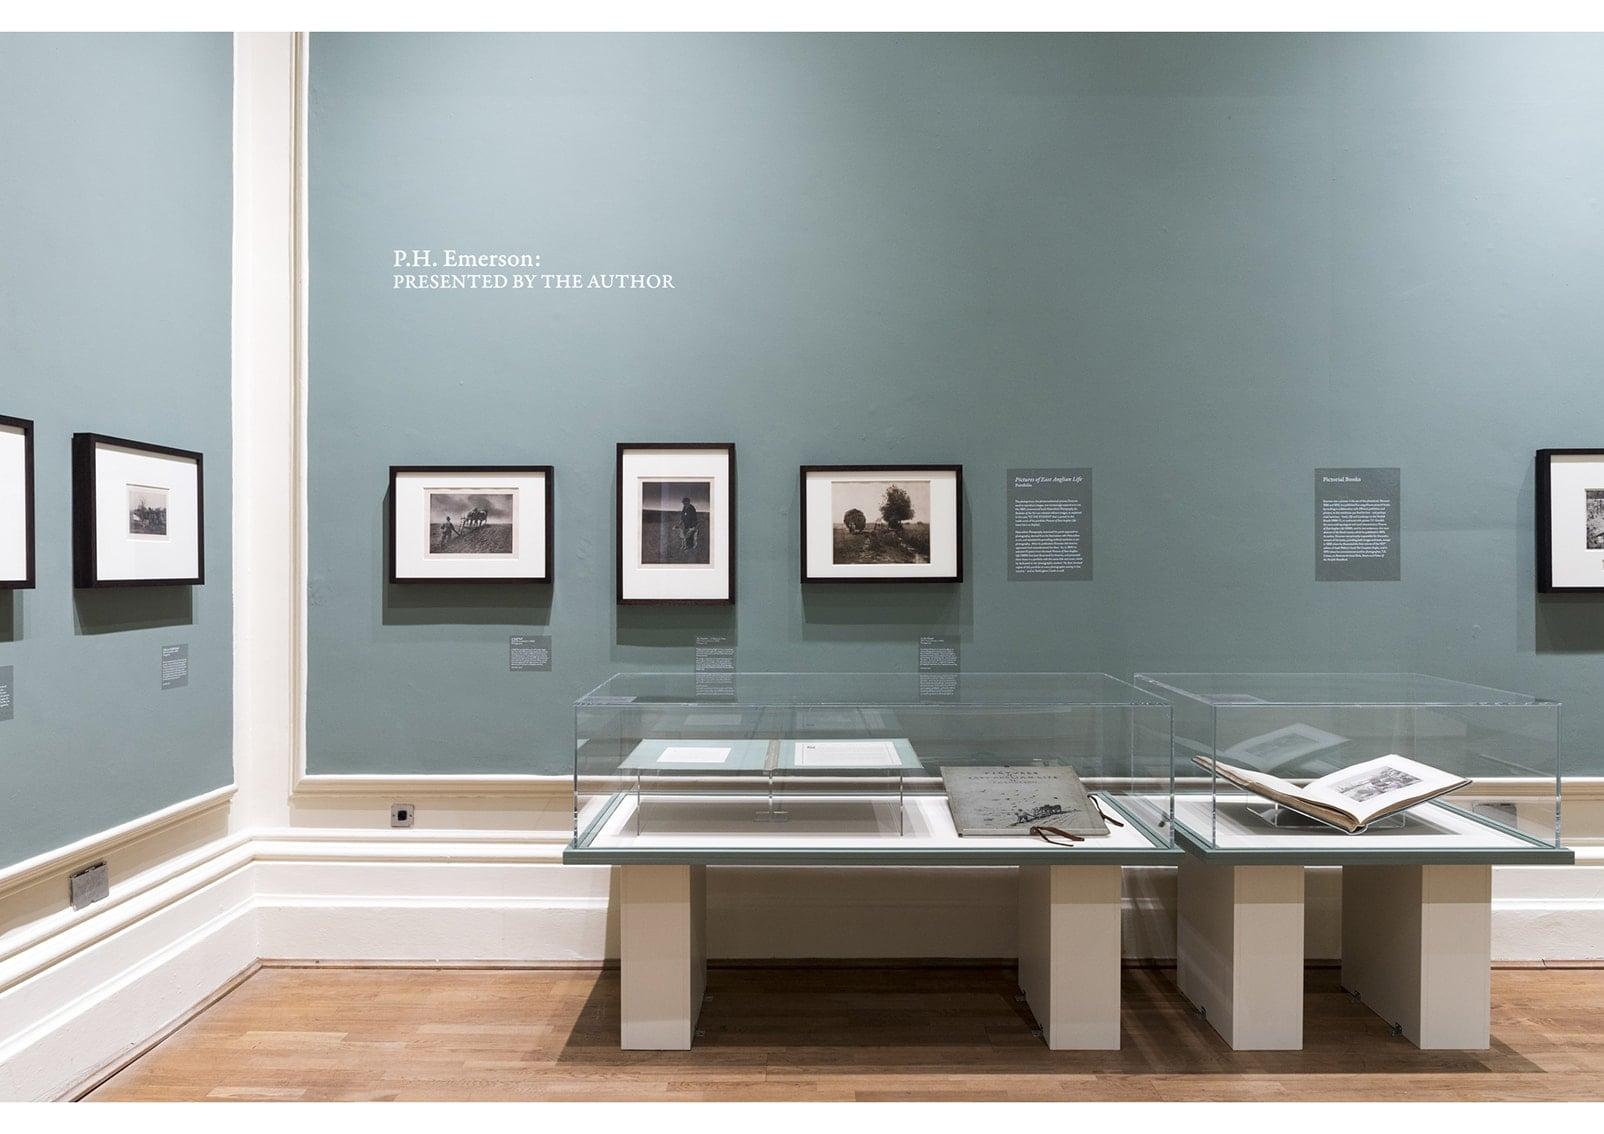 P. H Emerson at Nottingham Castle Museum & Art Gallery | John Hartley